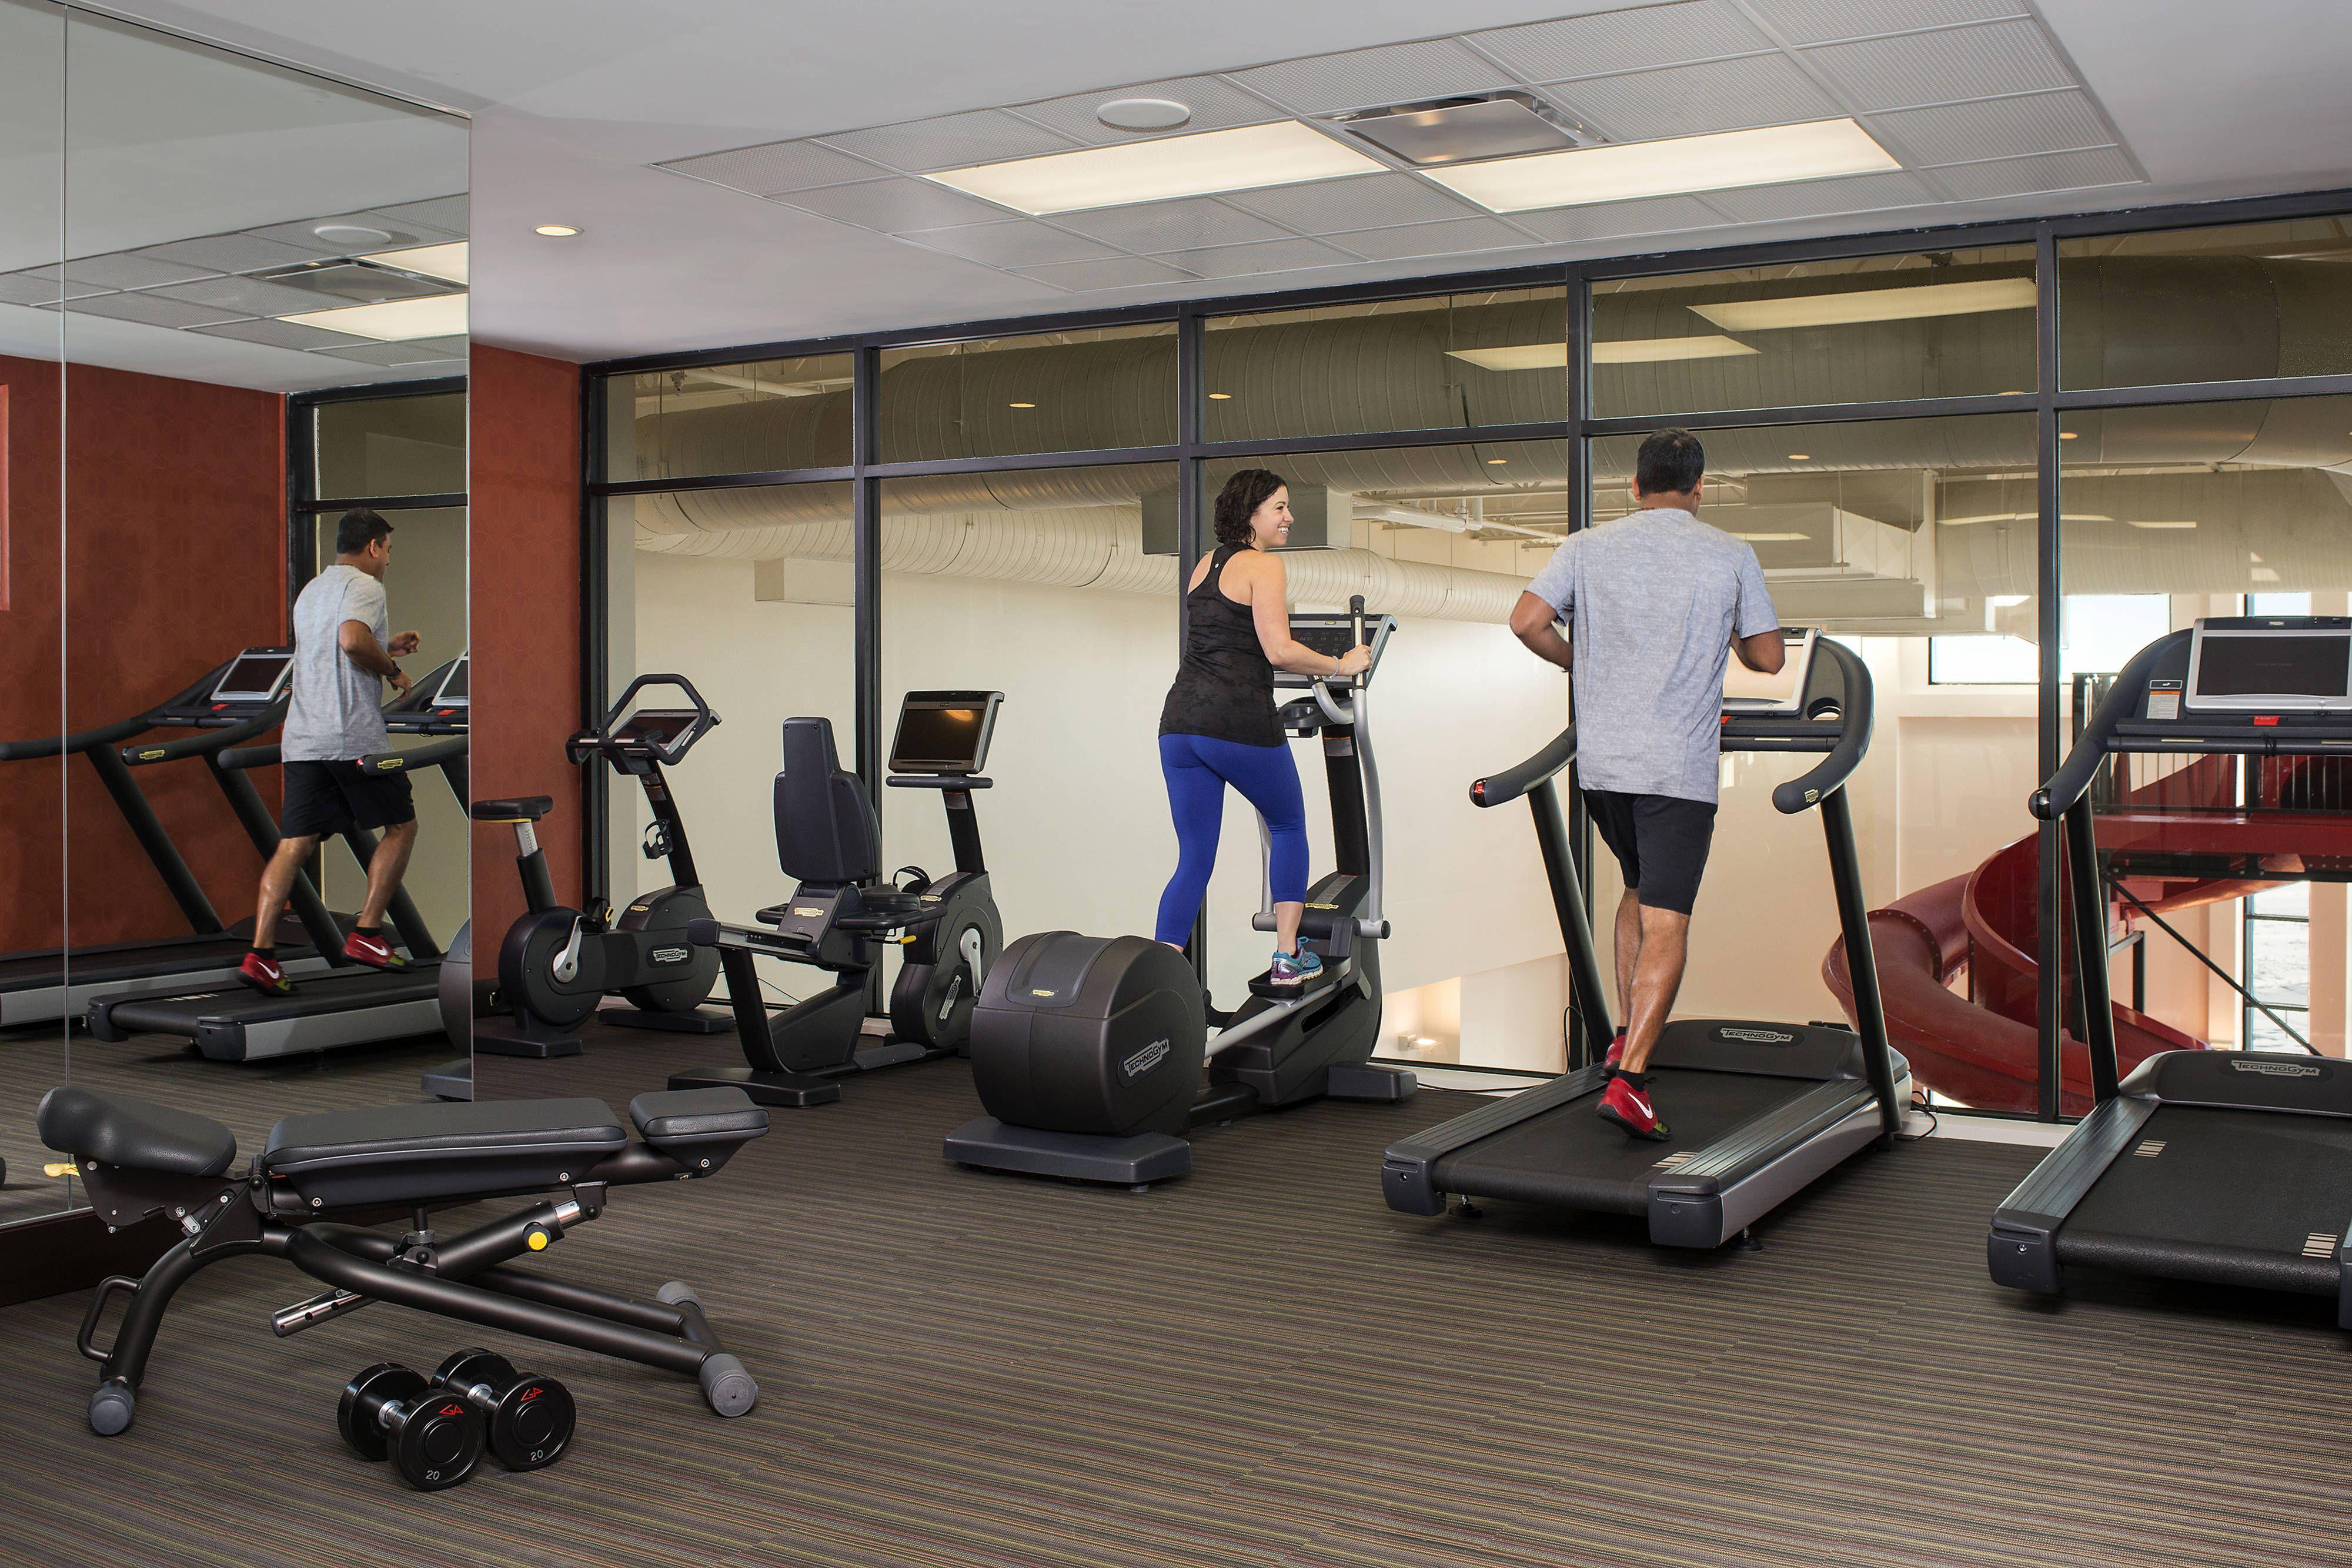 Residence Inn Calgary South Fitness Centre Travel Guestbathroom Enjoying Hotels In Calgary Leading Hotels Courtyard